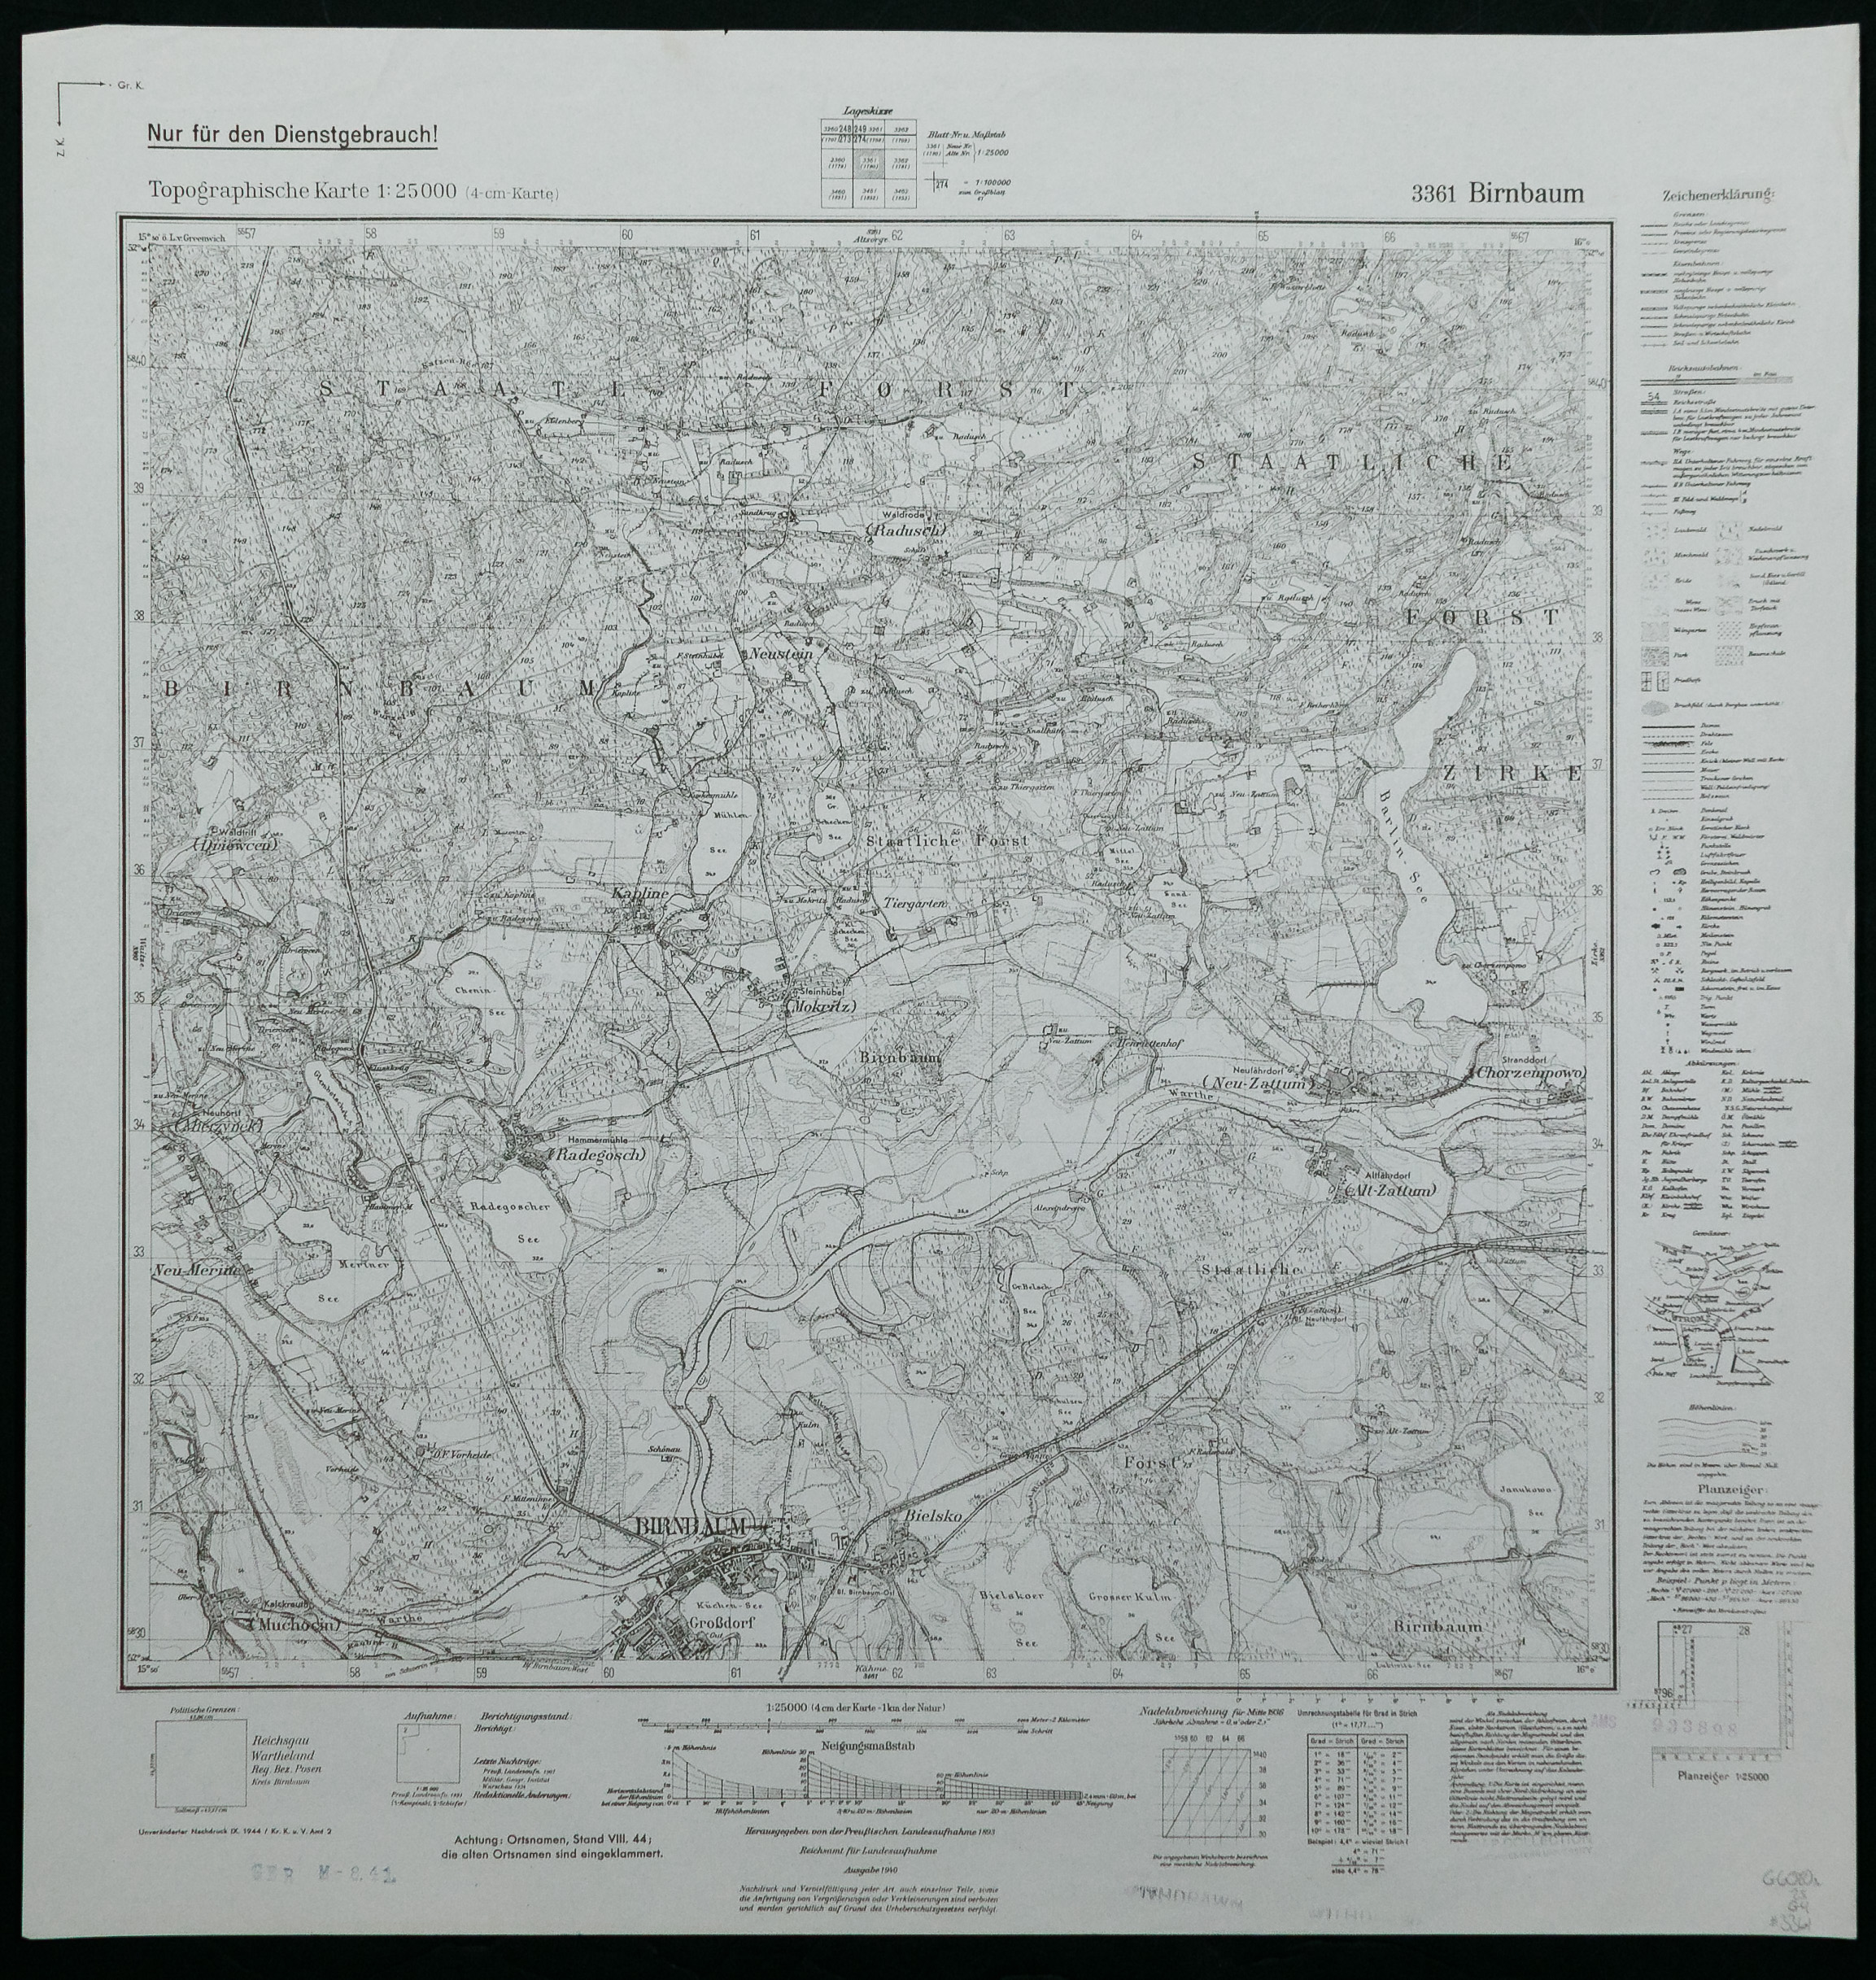 World War II Captured German Service Maps